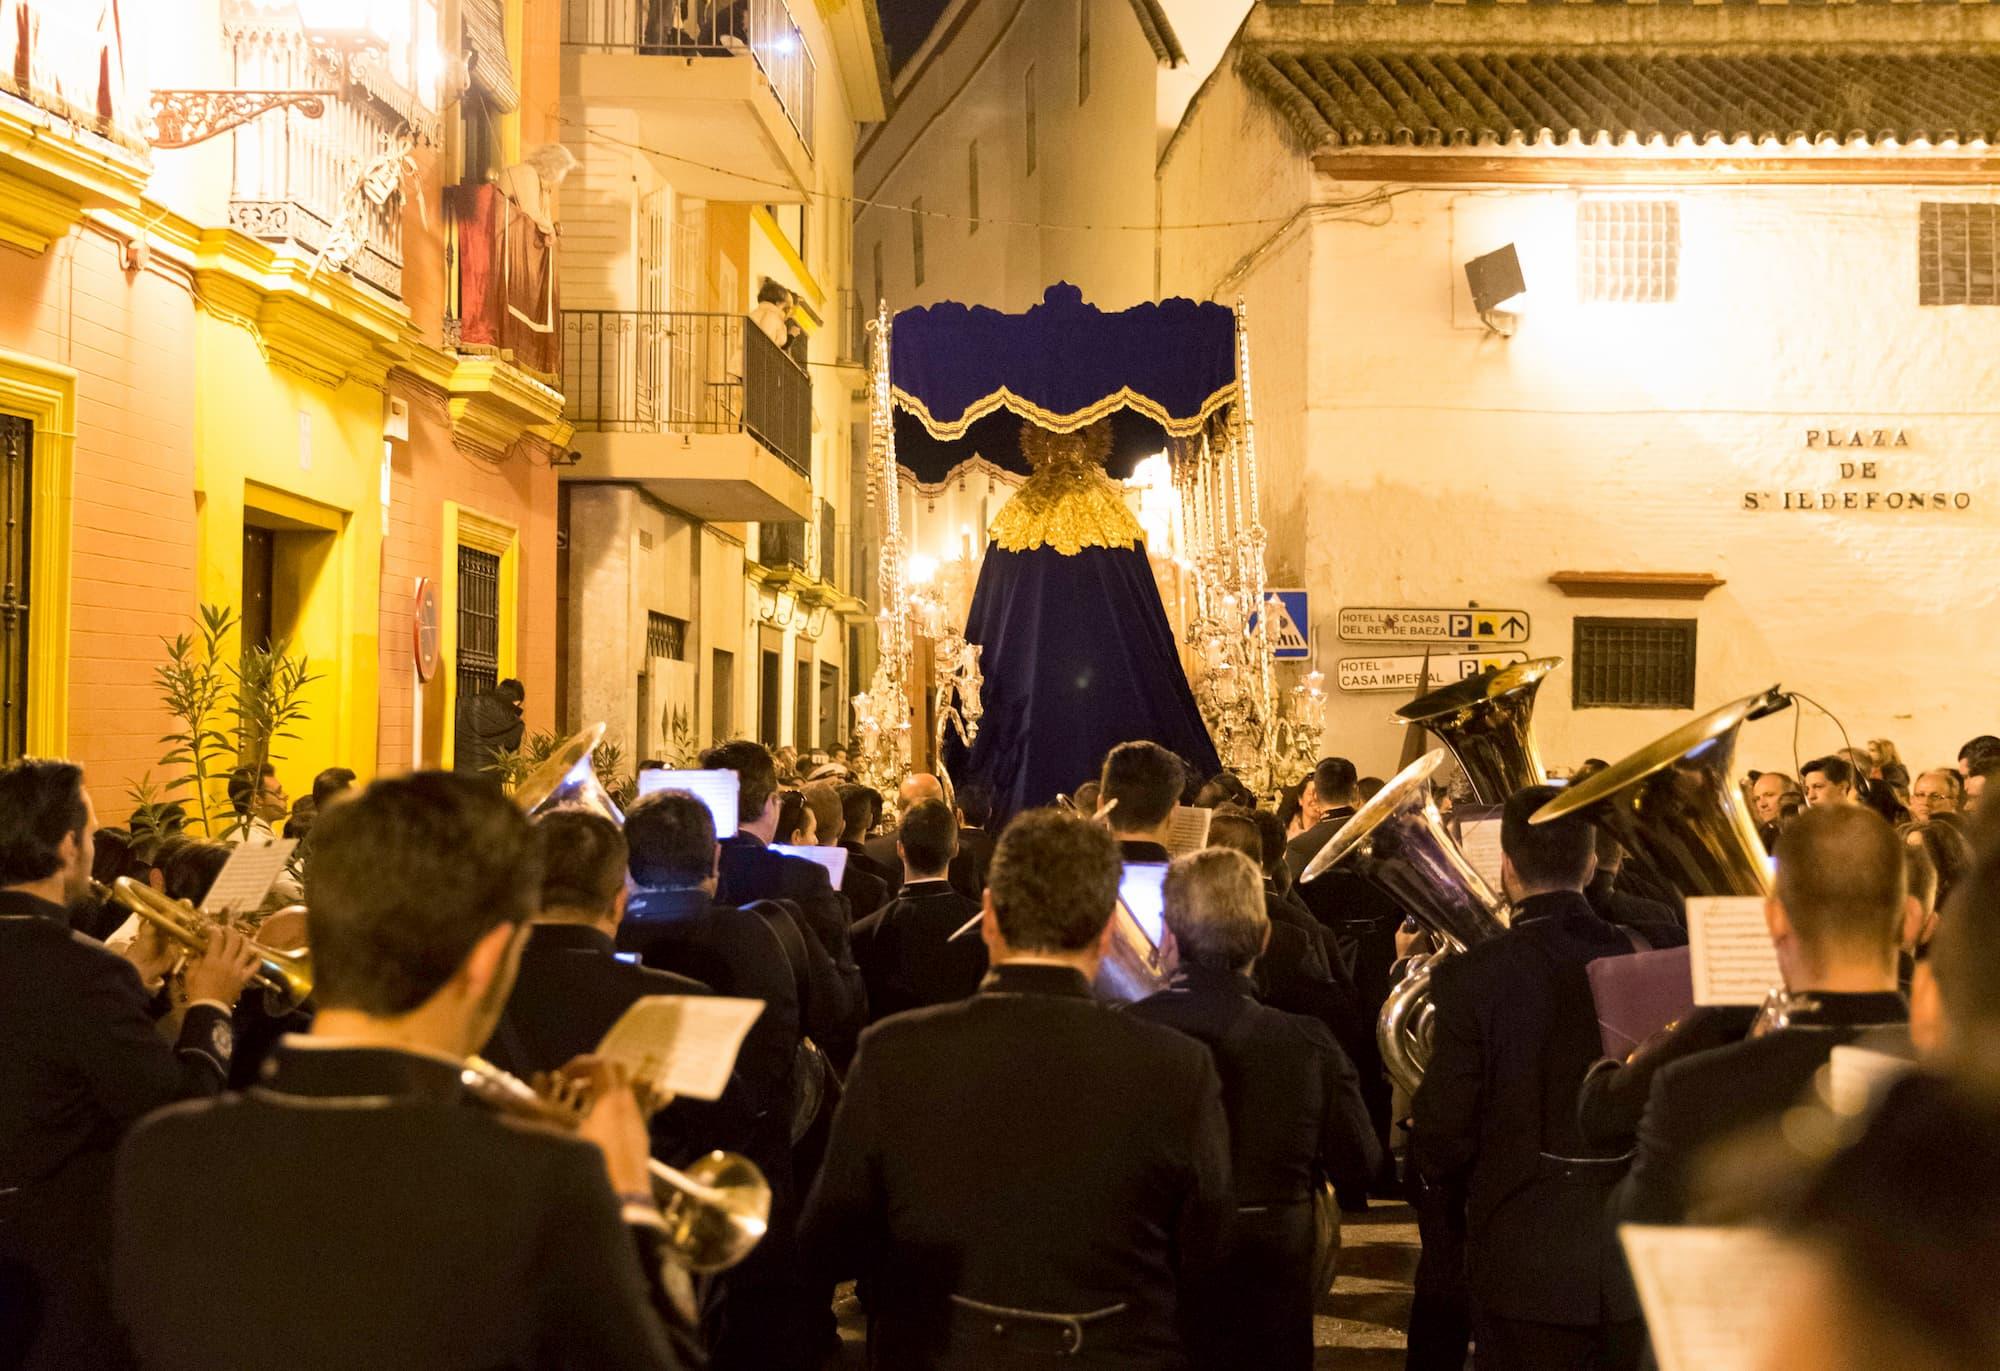 El patrimonio musical de la Hermanda del Carmen de Sevilla